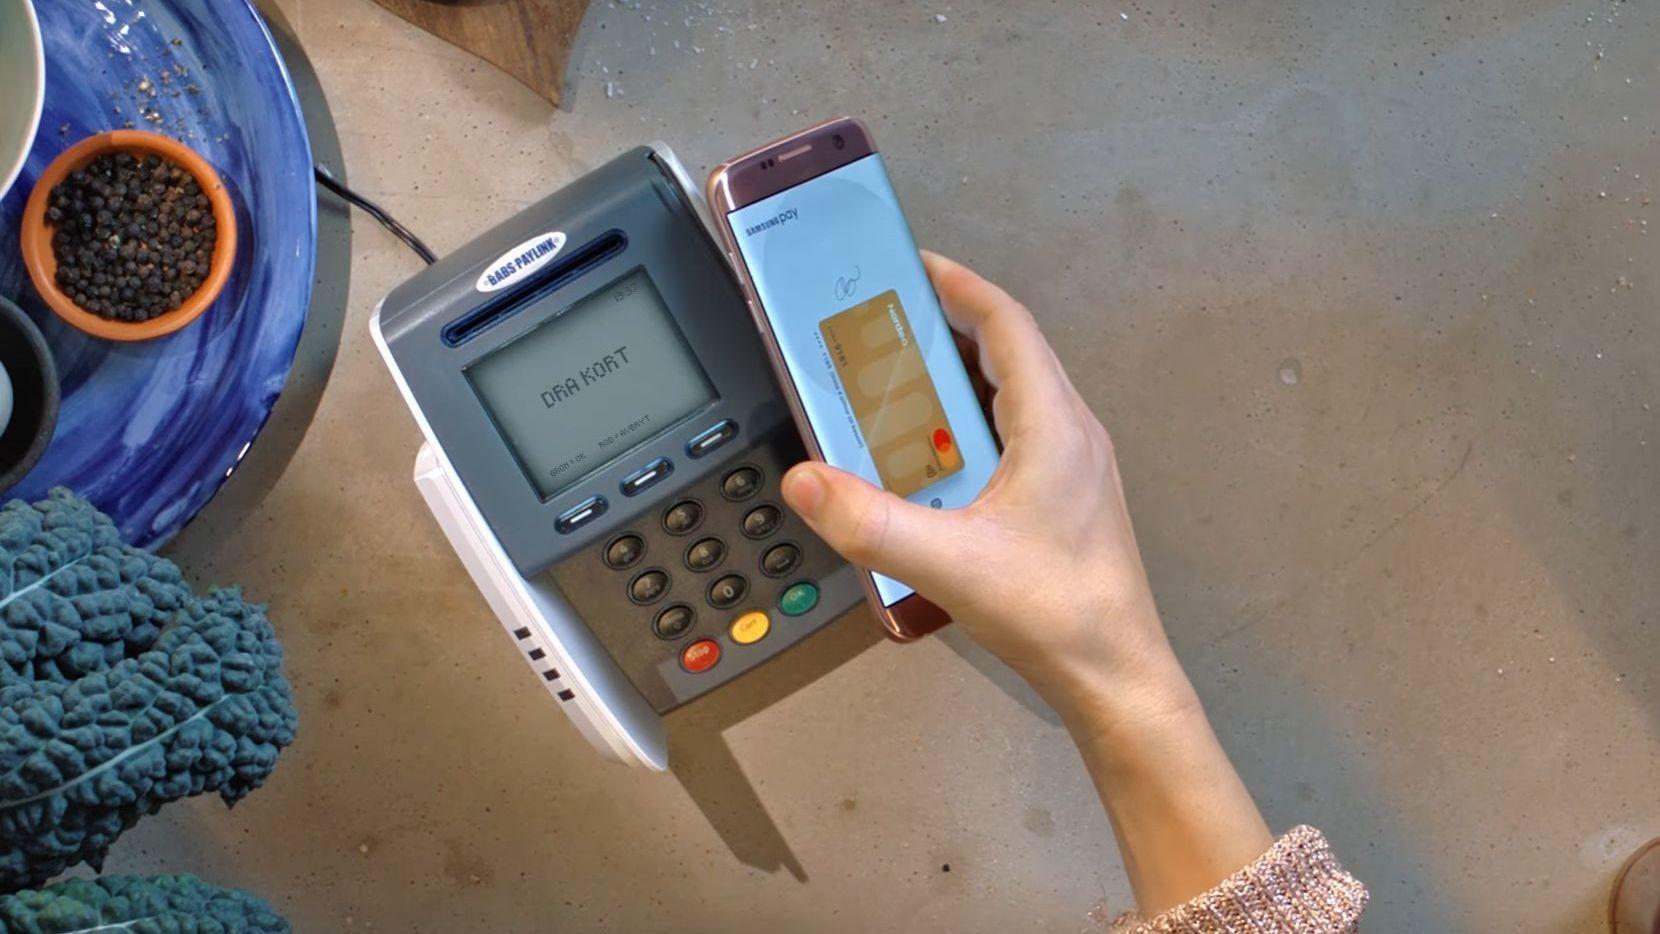 Nå har Samsungs mobilbetaling kommet til Sverige